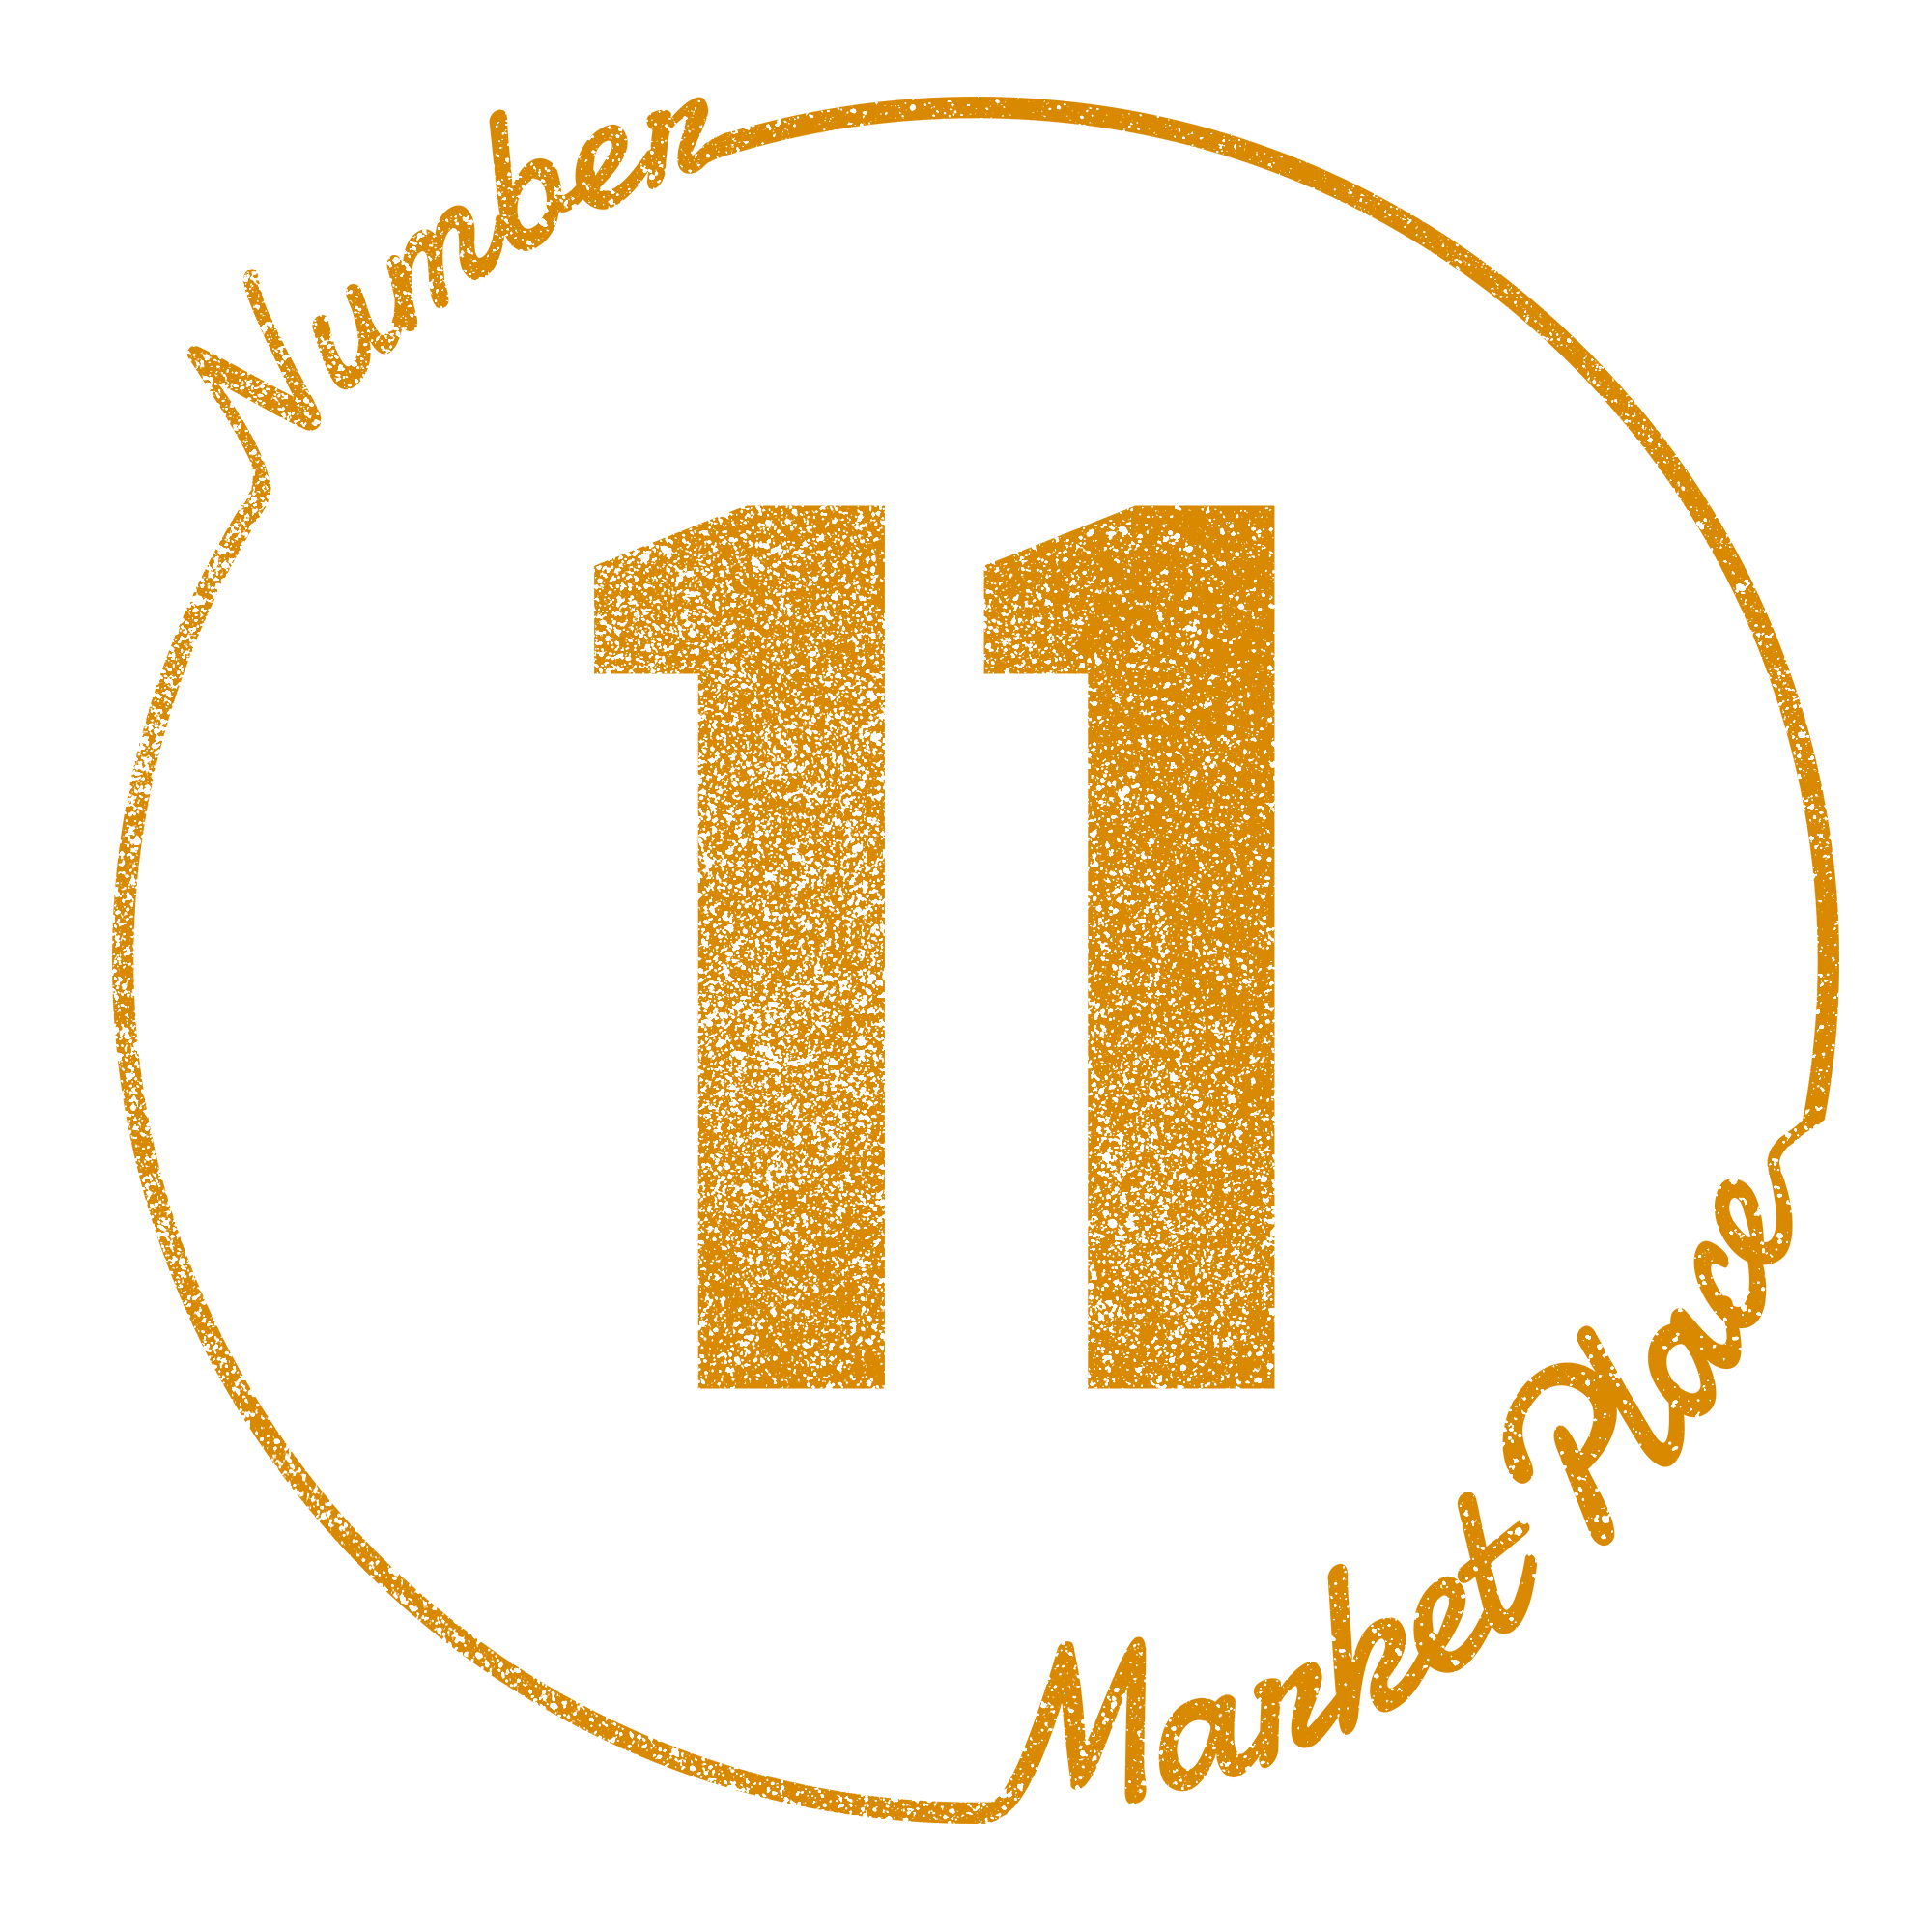 Number 11 Market Place – Restaurant in Whitehaven, Cumbria